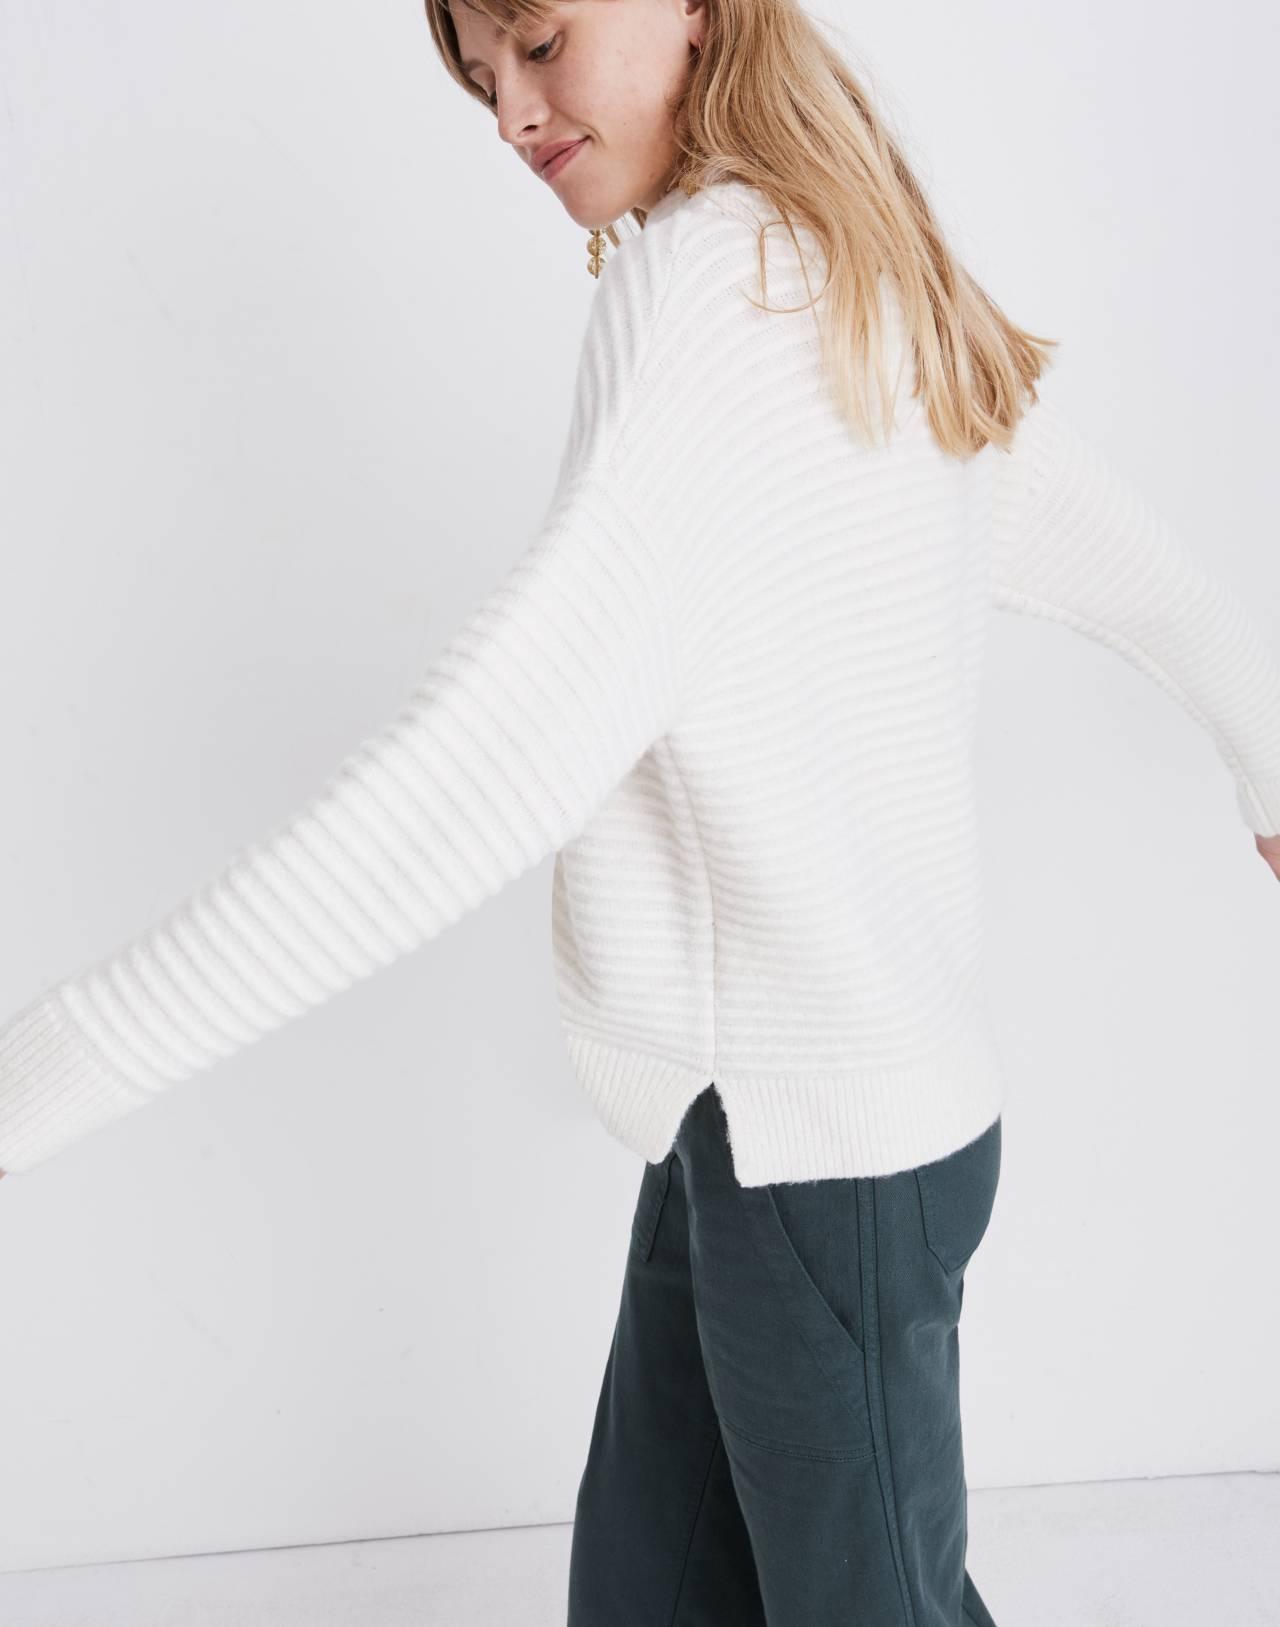 Belmont Mockneck Sweater in Coziest Yarn in antique cream image 2